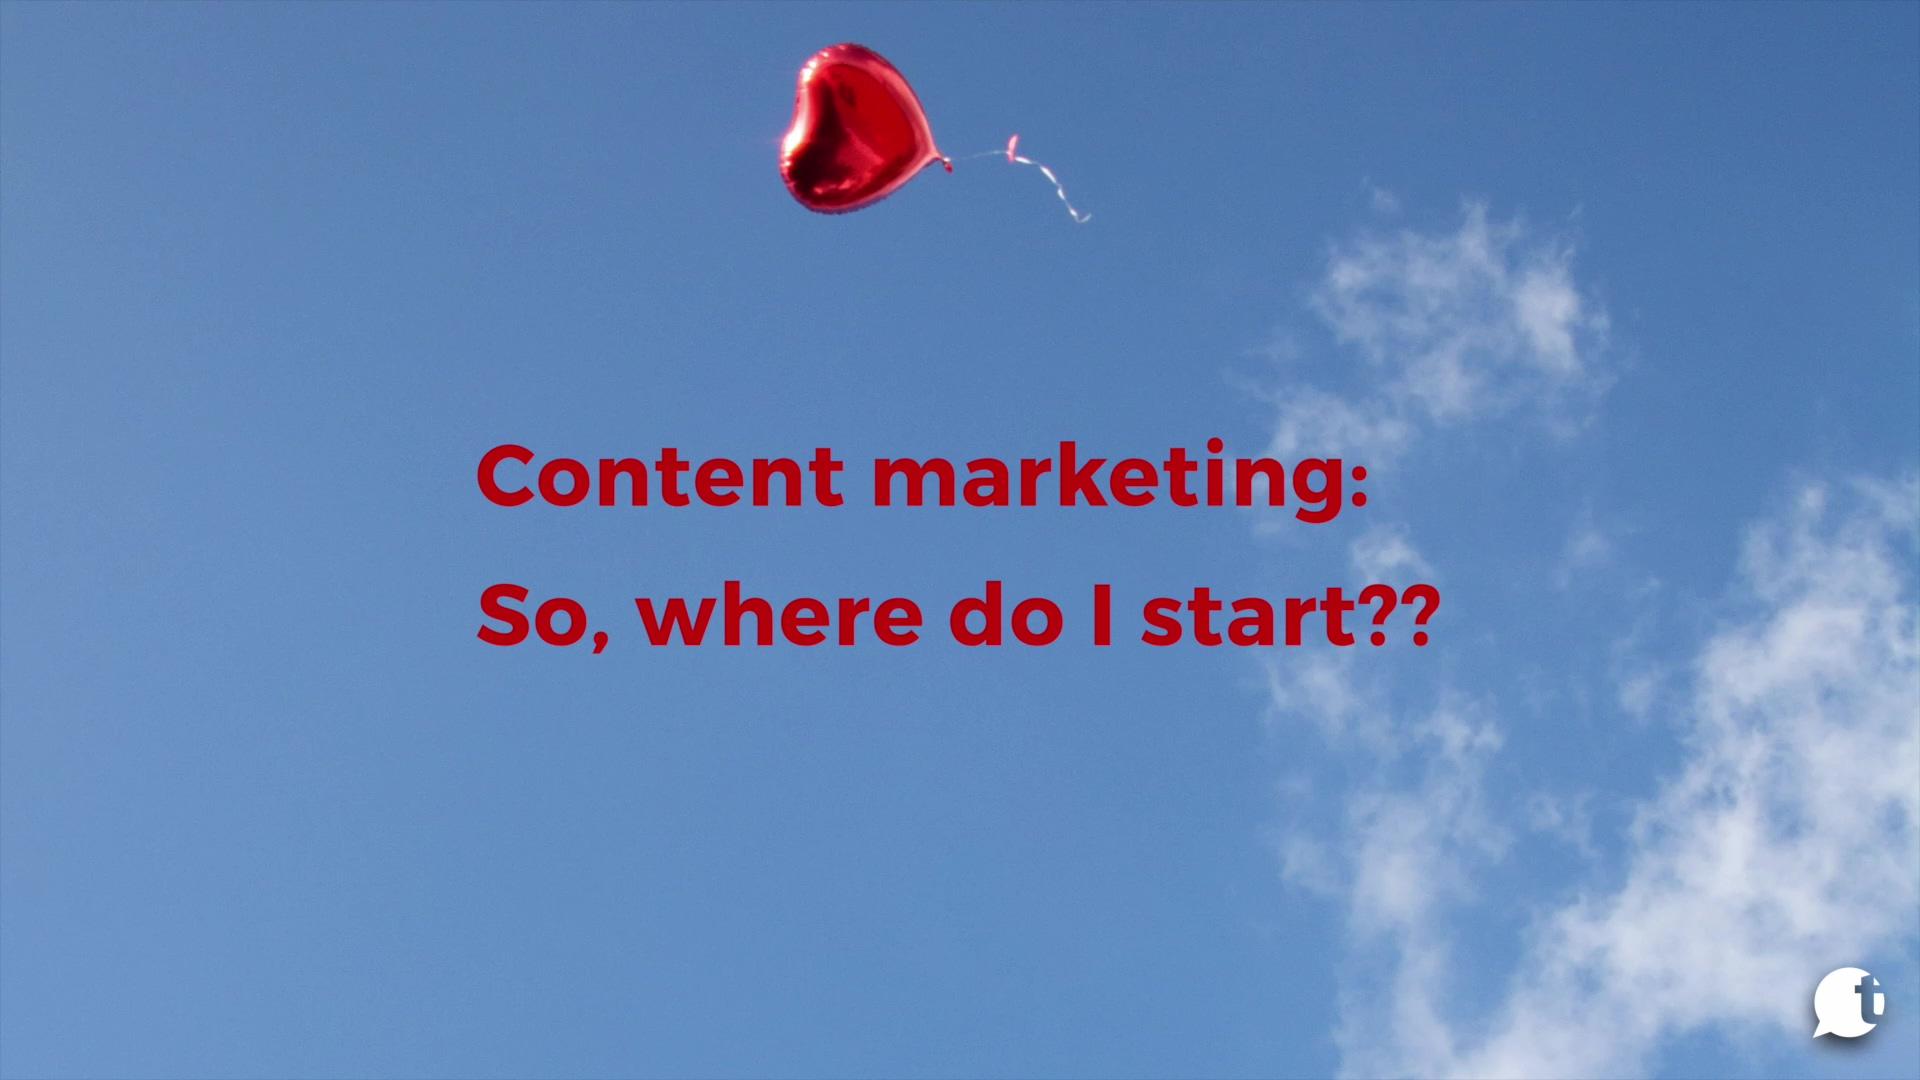 Content Marketing Where do I start